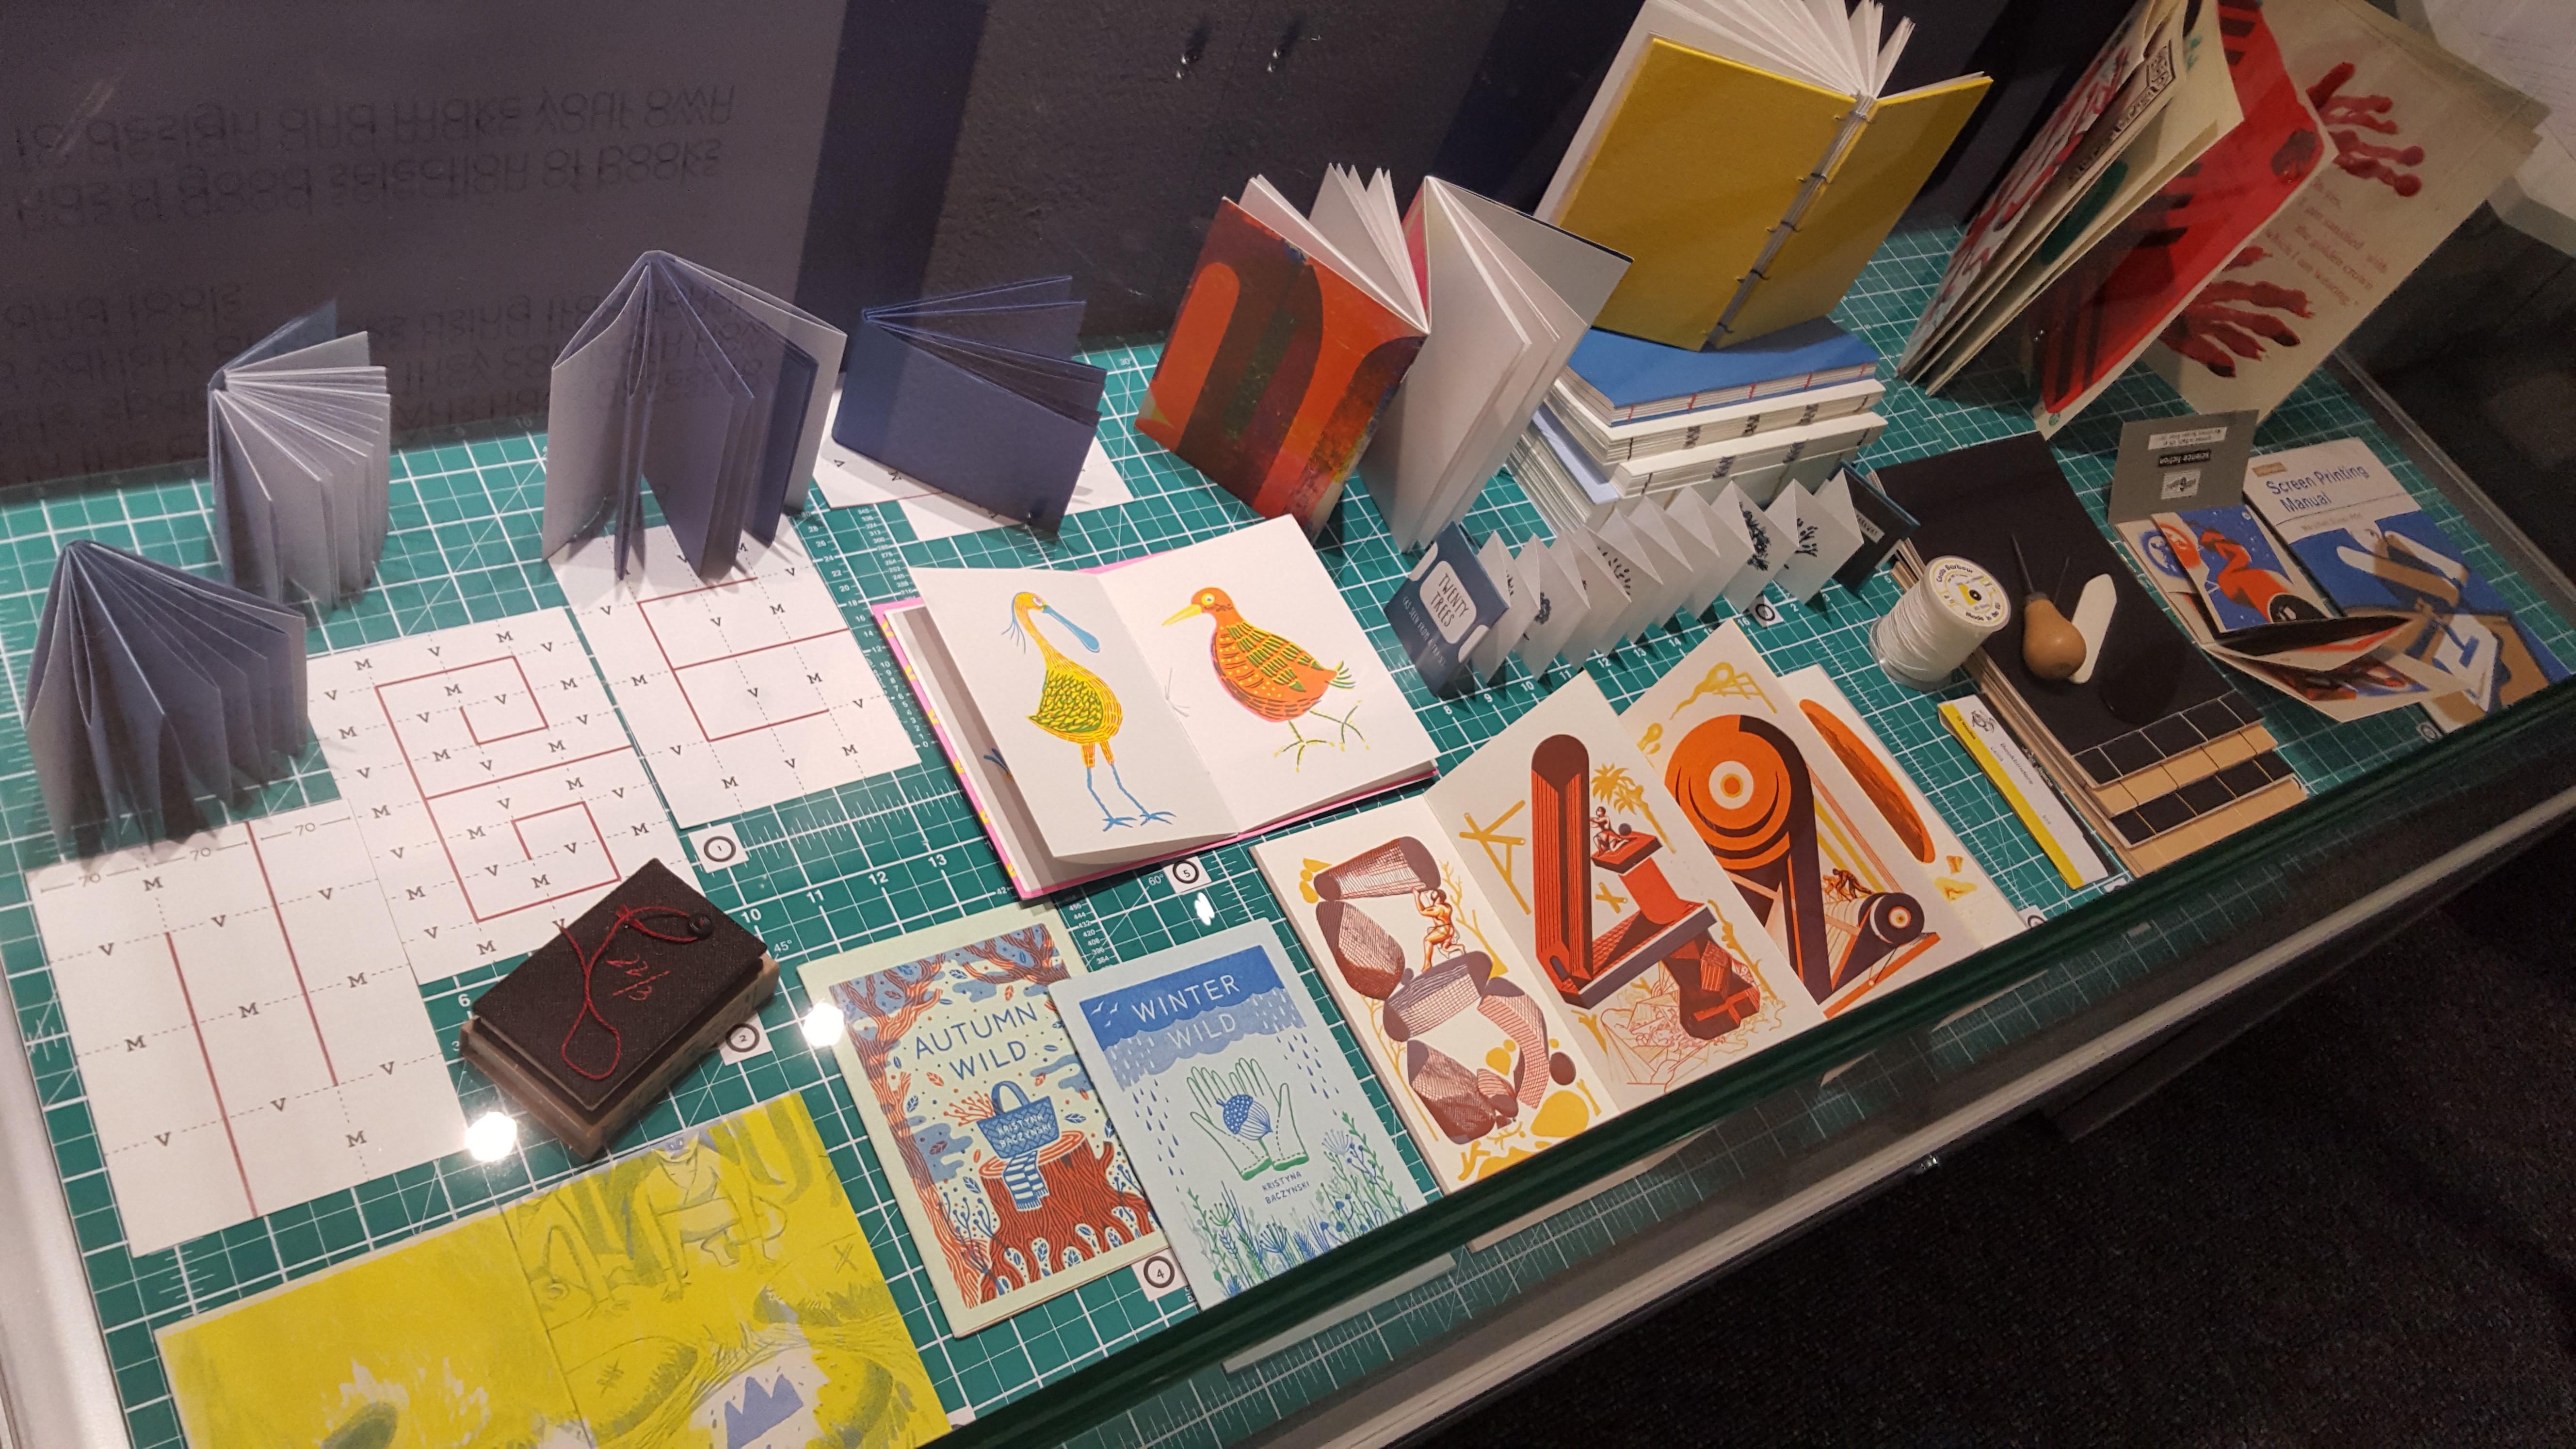 Book arts display